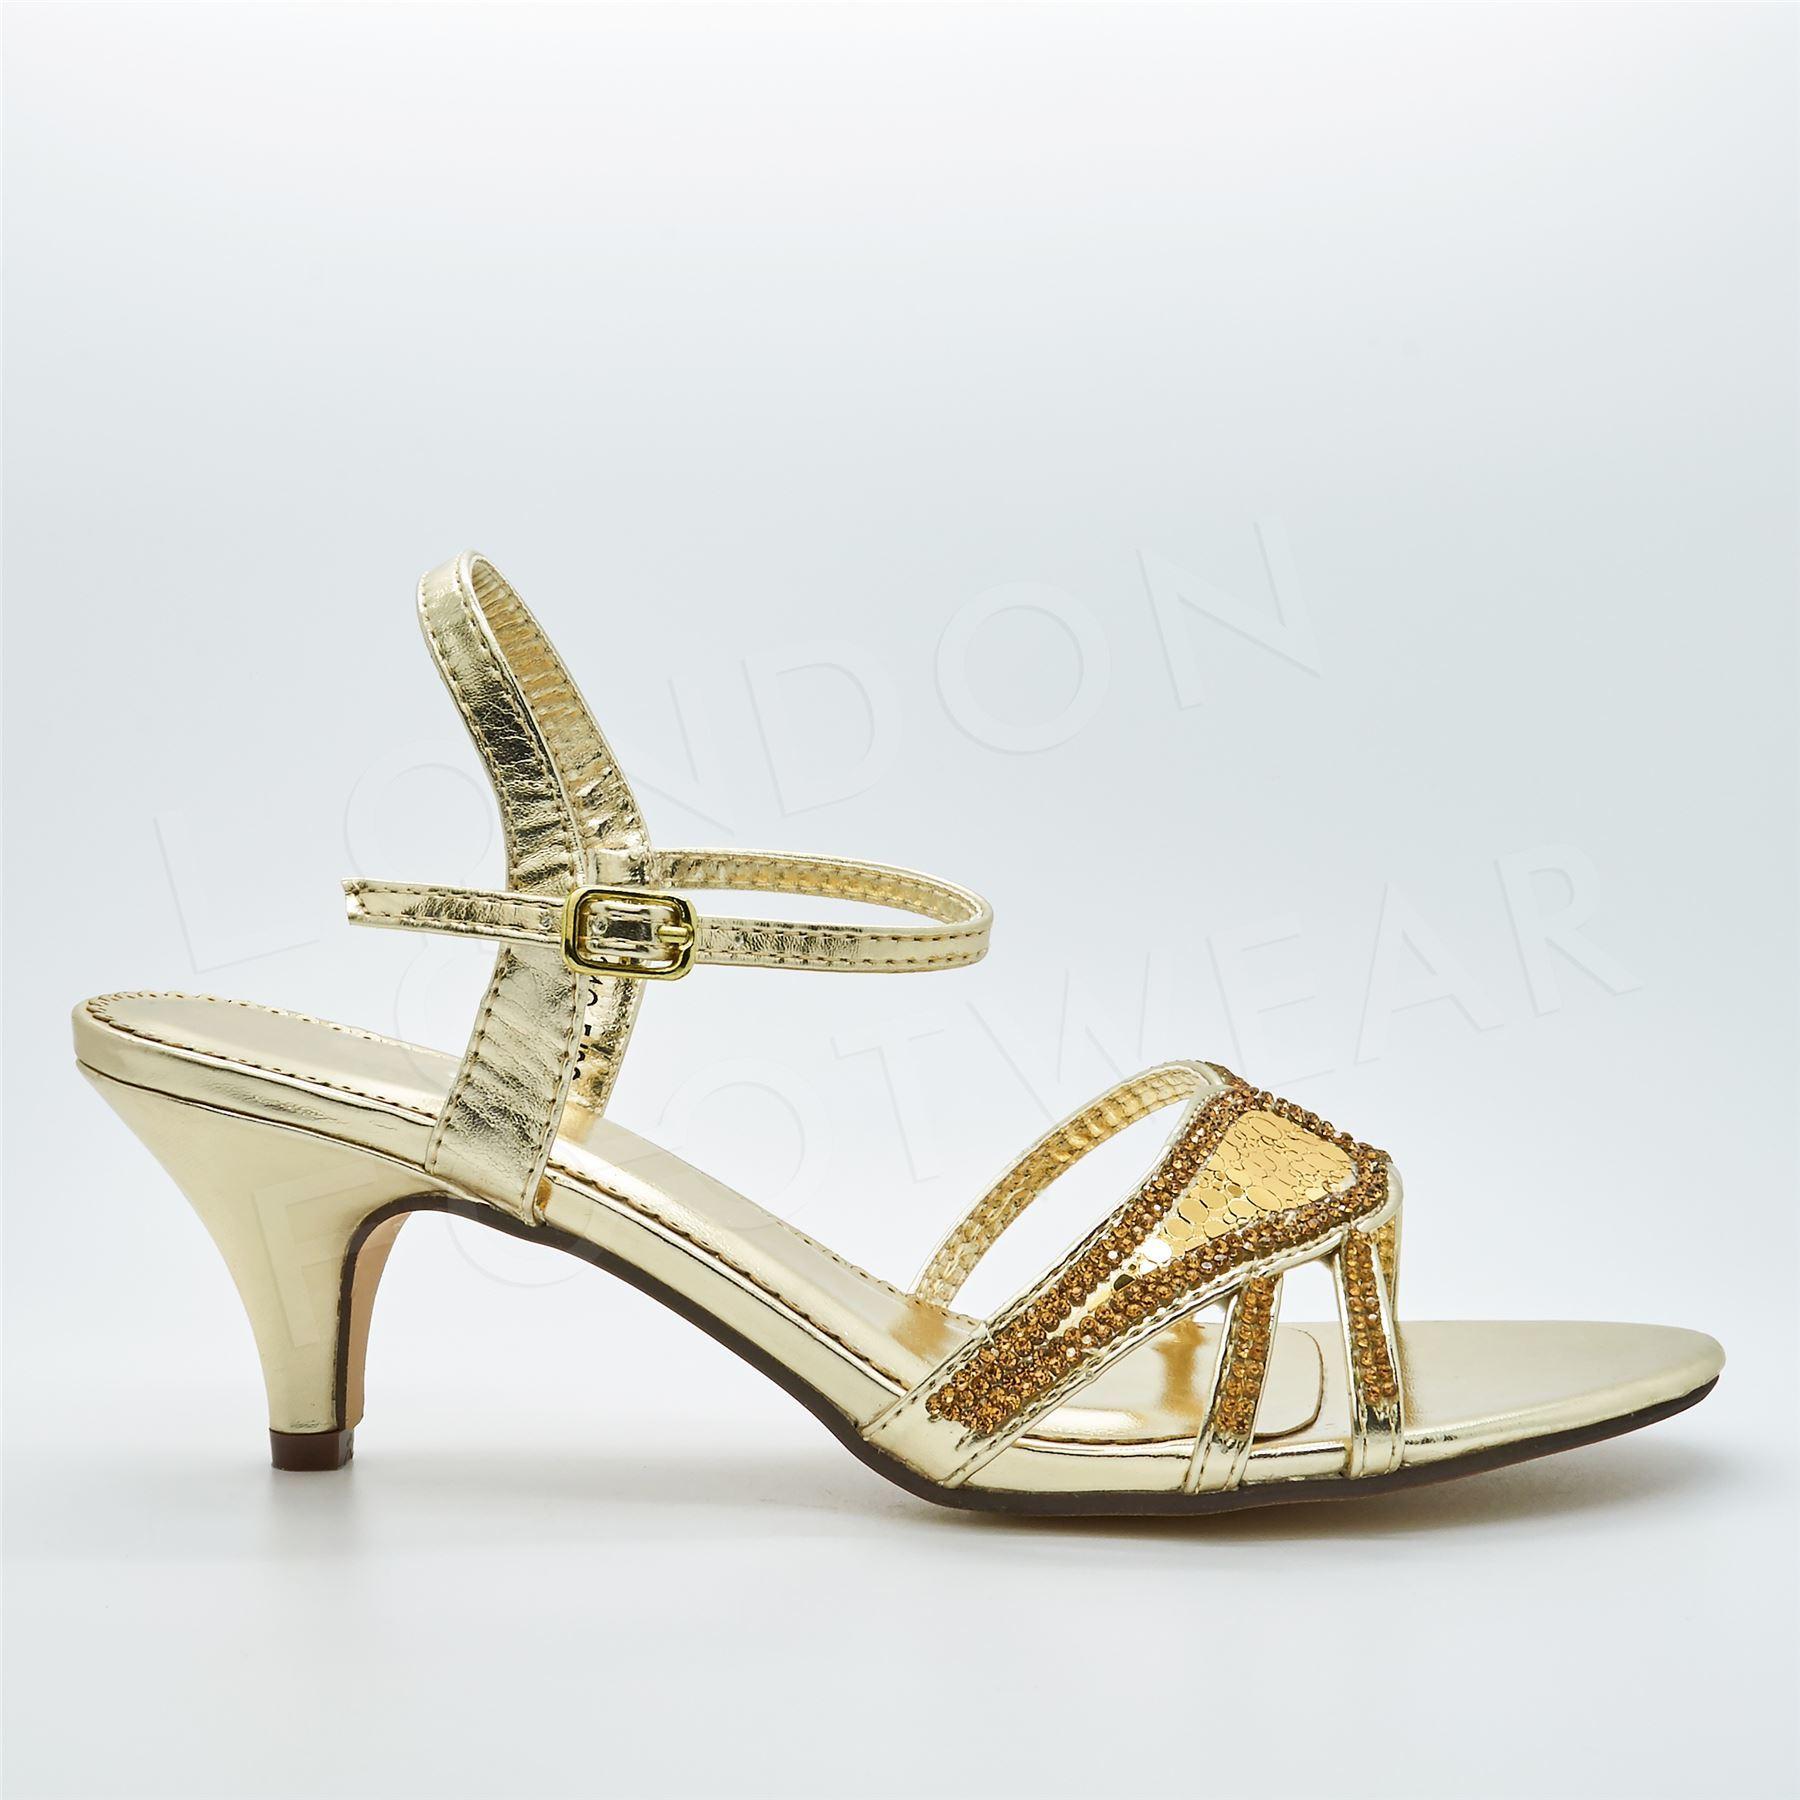 8b2ec9e10a5 New Womens Diamante Low Kitten Heels Strappy Sandals Ladies Bridal ...